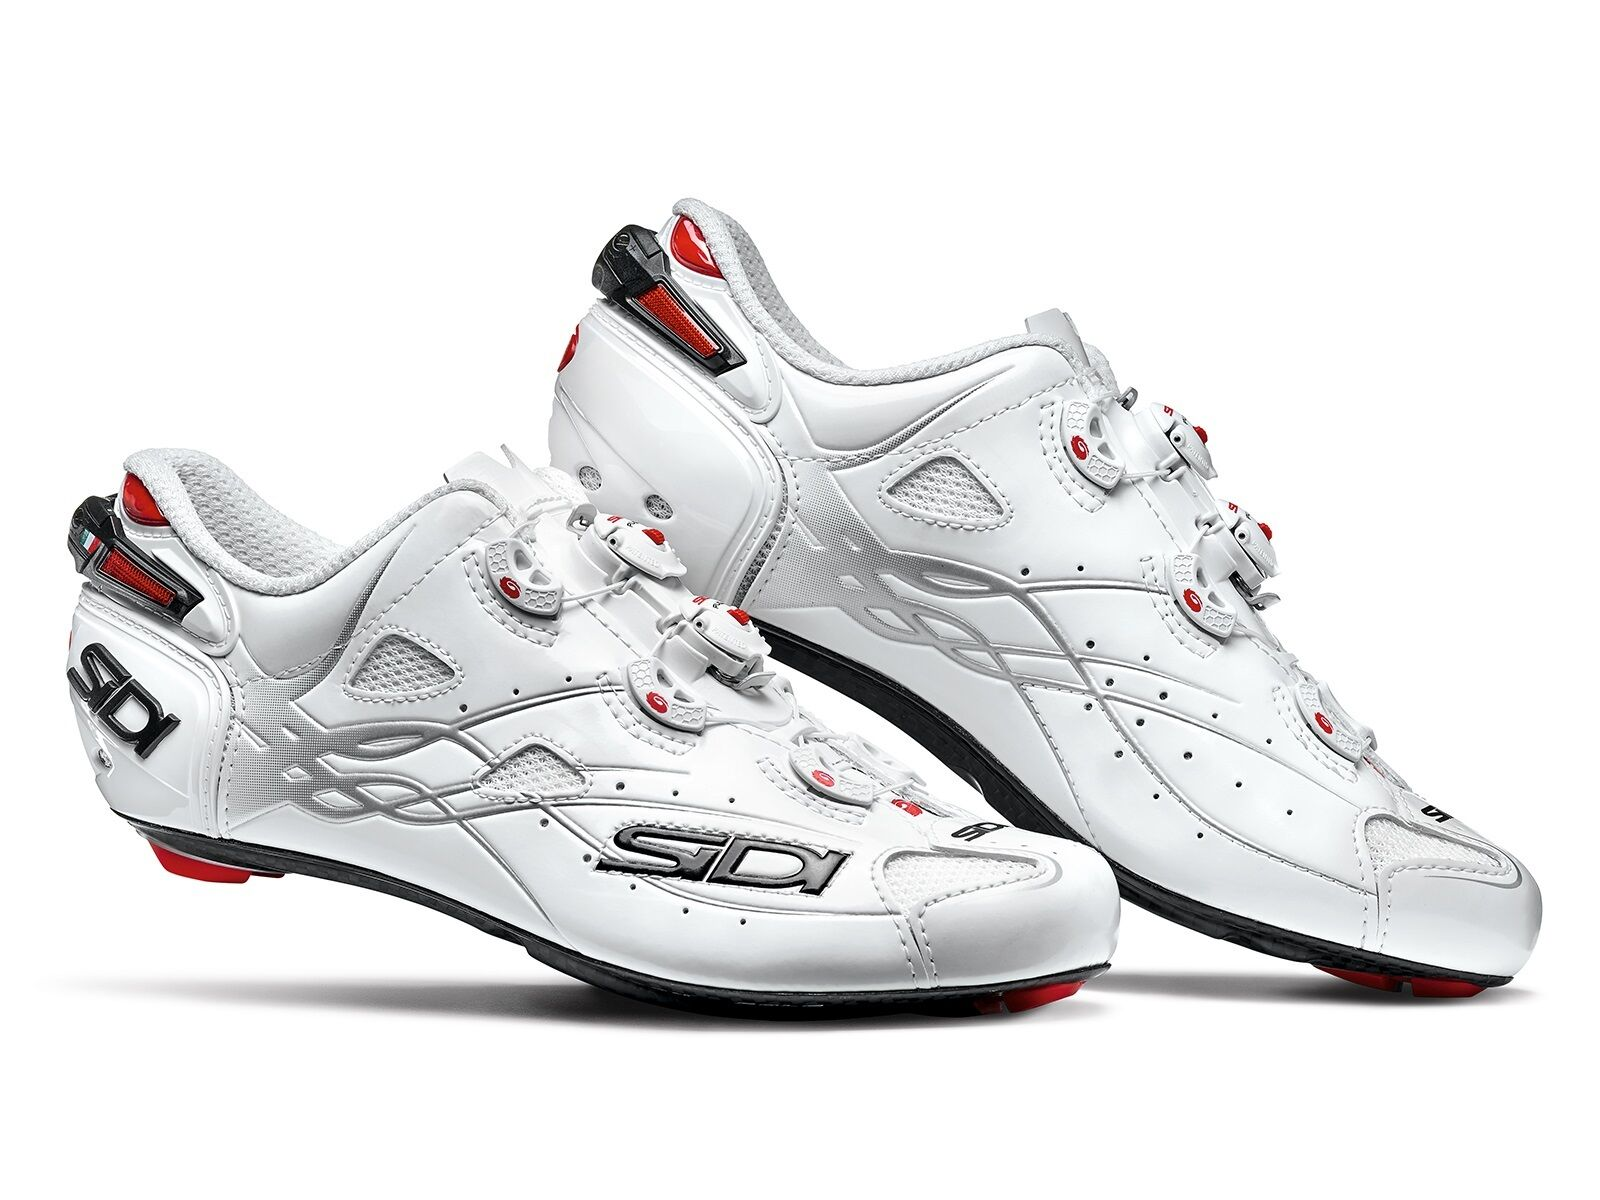 New Sidi Shot Cycling Schuhes, Weiß Weiß, EU40-47